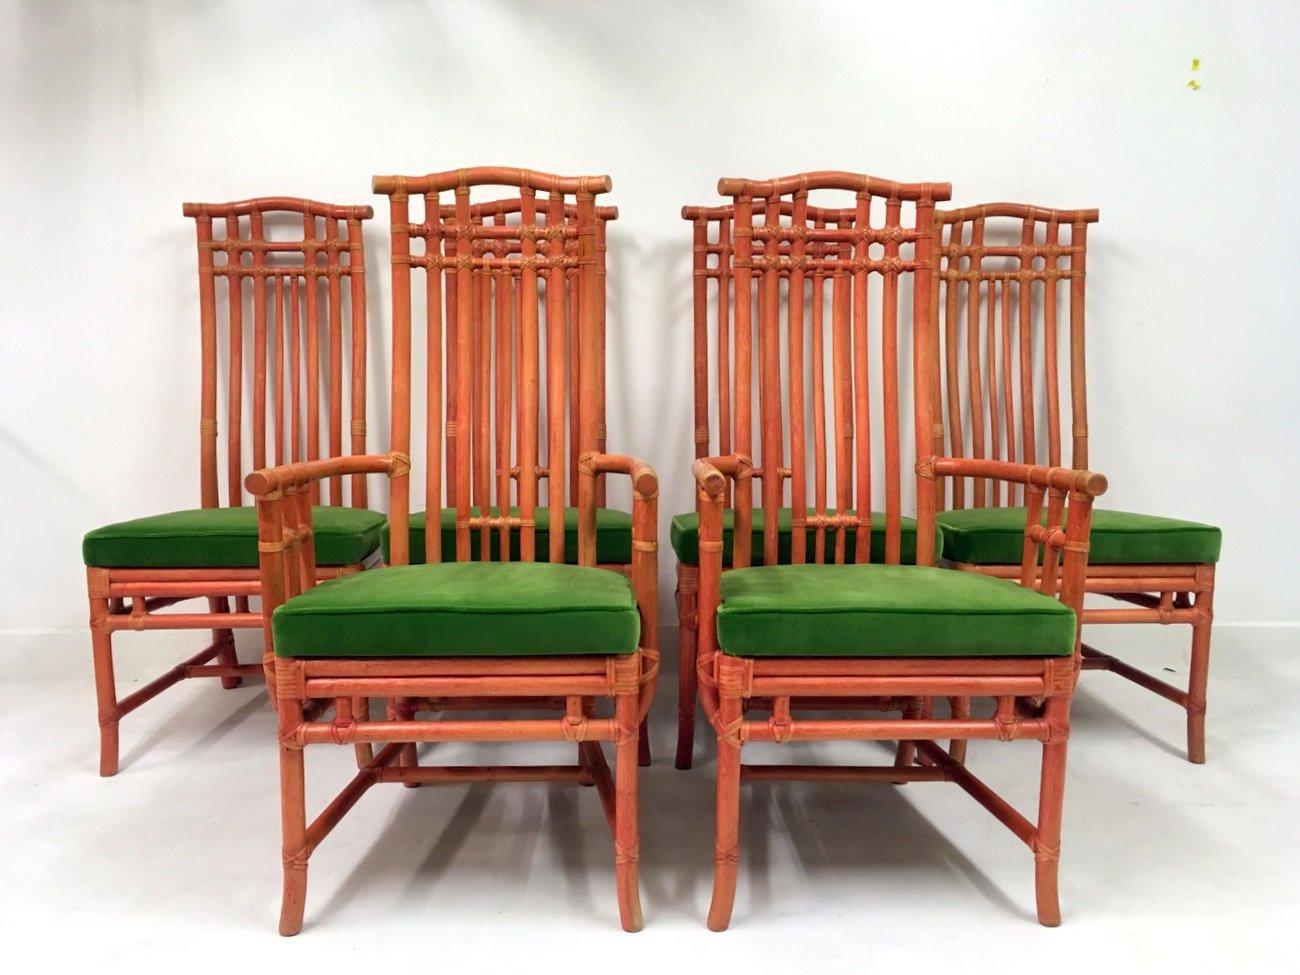 Sedie Vintage Colorate : Sedie da pranzo vintage in bambù e velluto verde di mcguire set